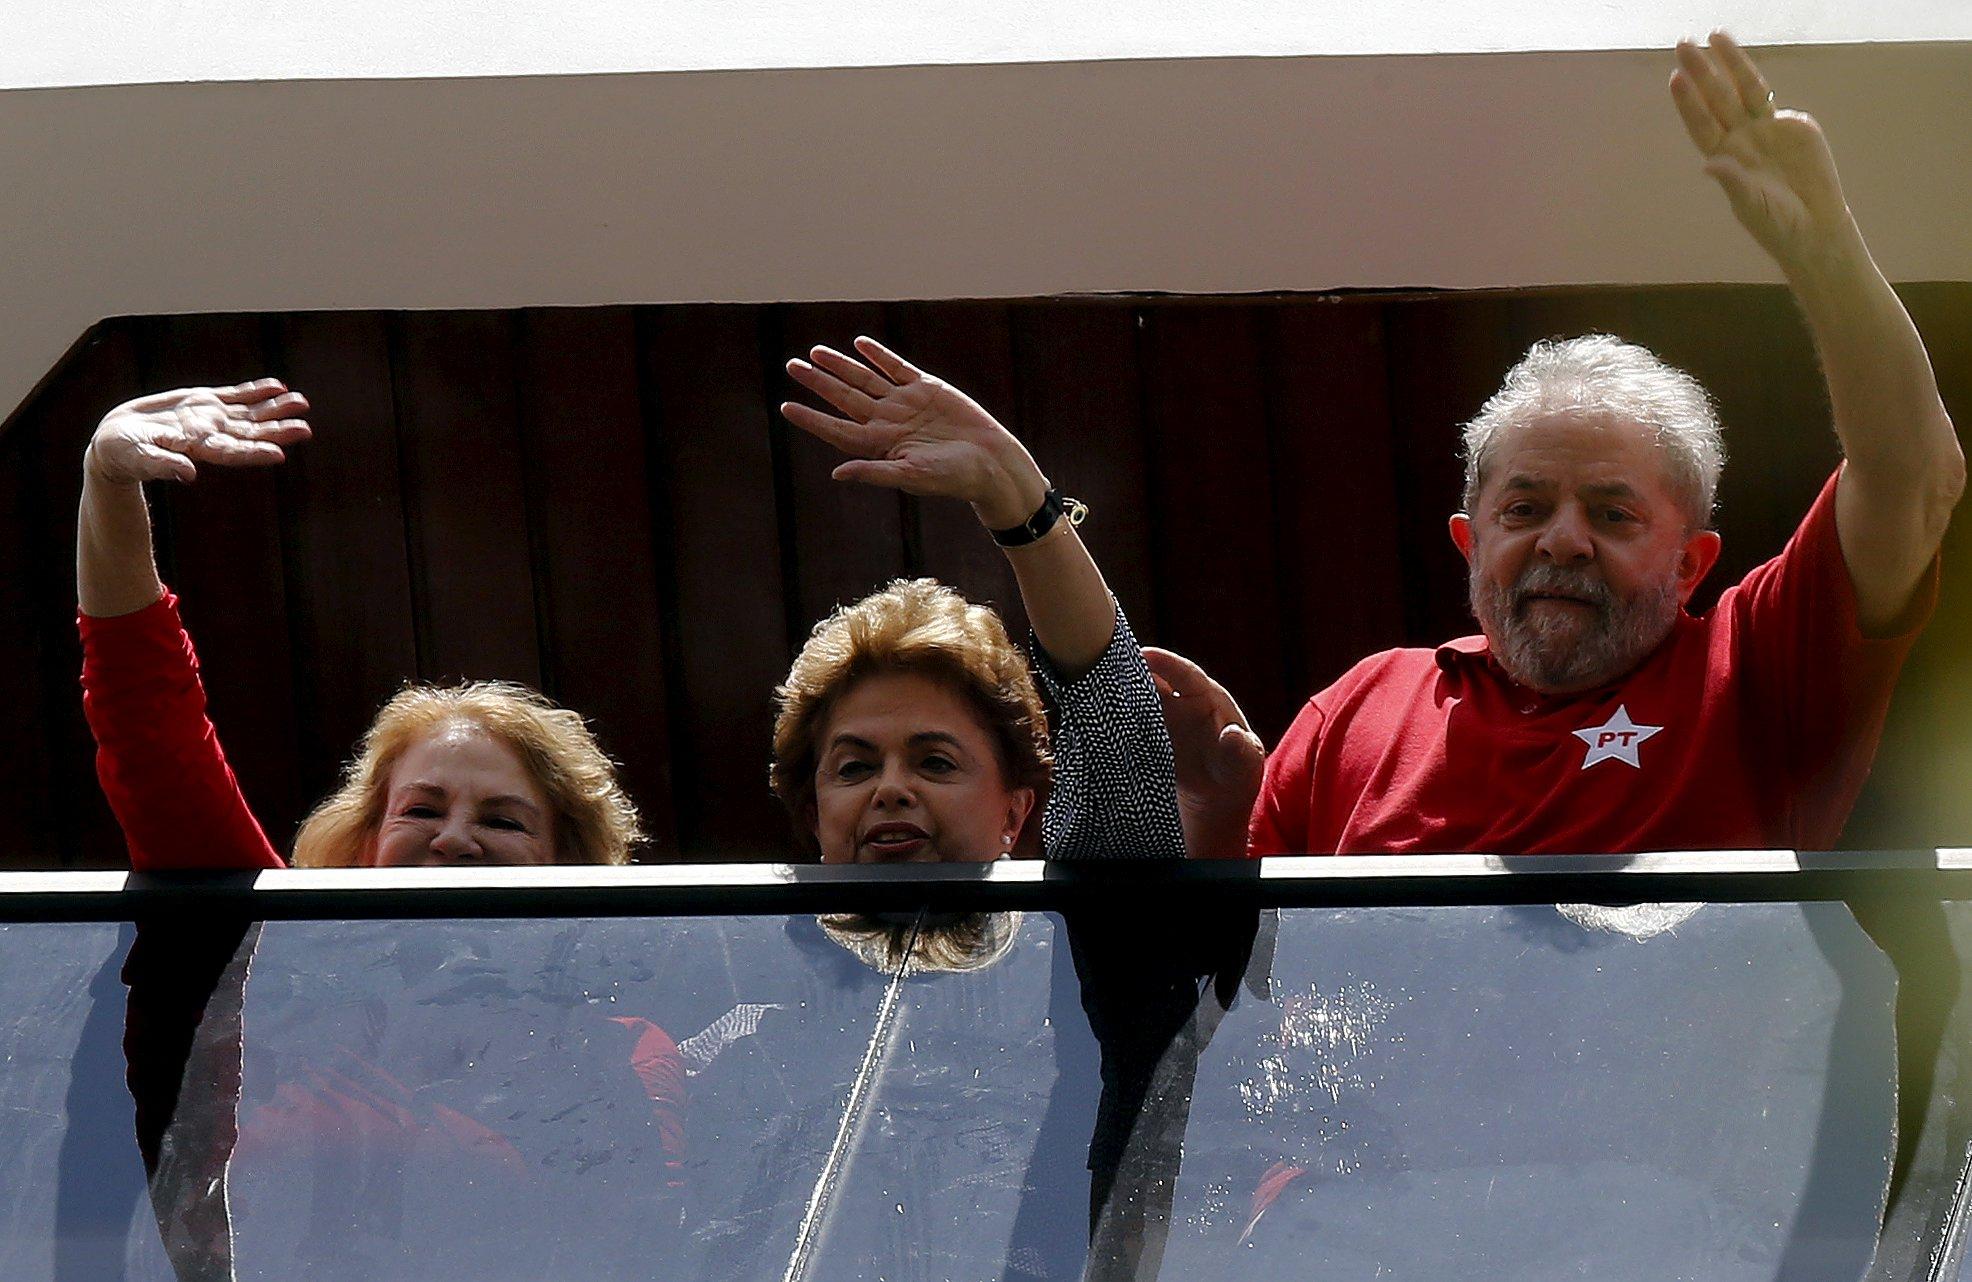 Former Brazilian President Luiz Inacio Lula da Silva (R), his wife Marisa and Brazilian President Dilma Rousseff (C) wave from the window of his home in Sao Bernardo do Camopo, Brazil, March 5, 2016. REUTERS/Paulo Whitaker TPX IMAGES OF THE DAY